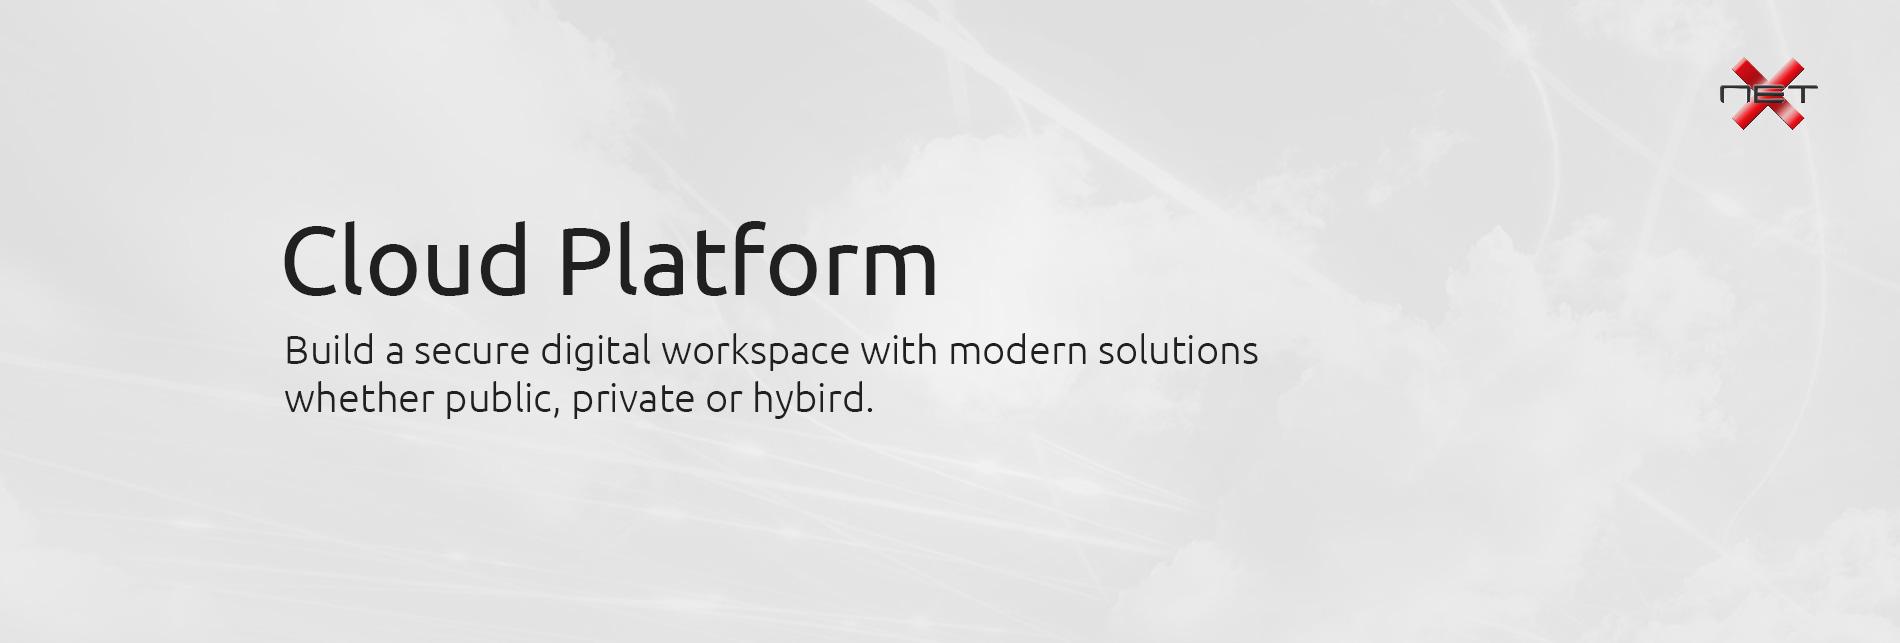 Cloud Platform - NetX Information Systems Banner